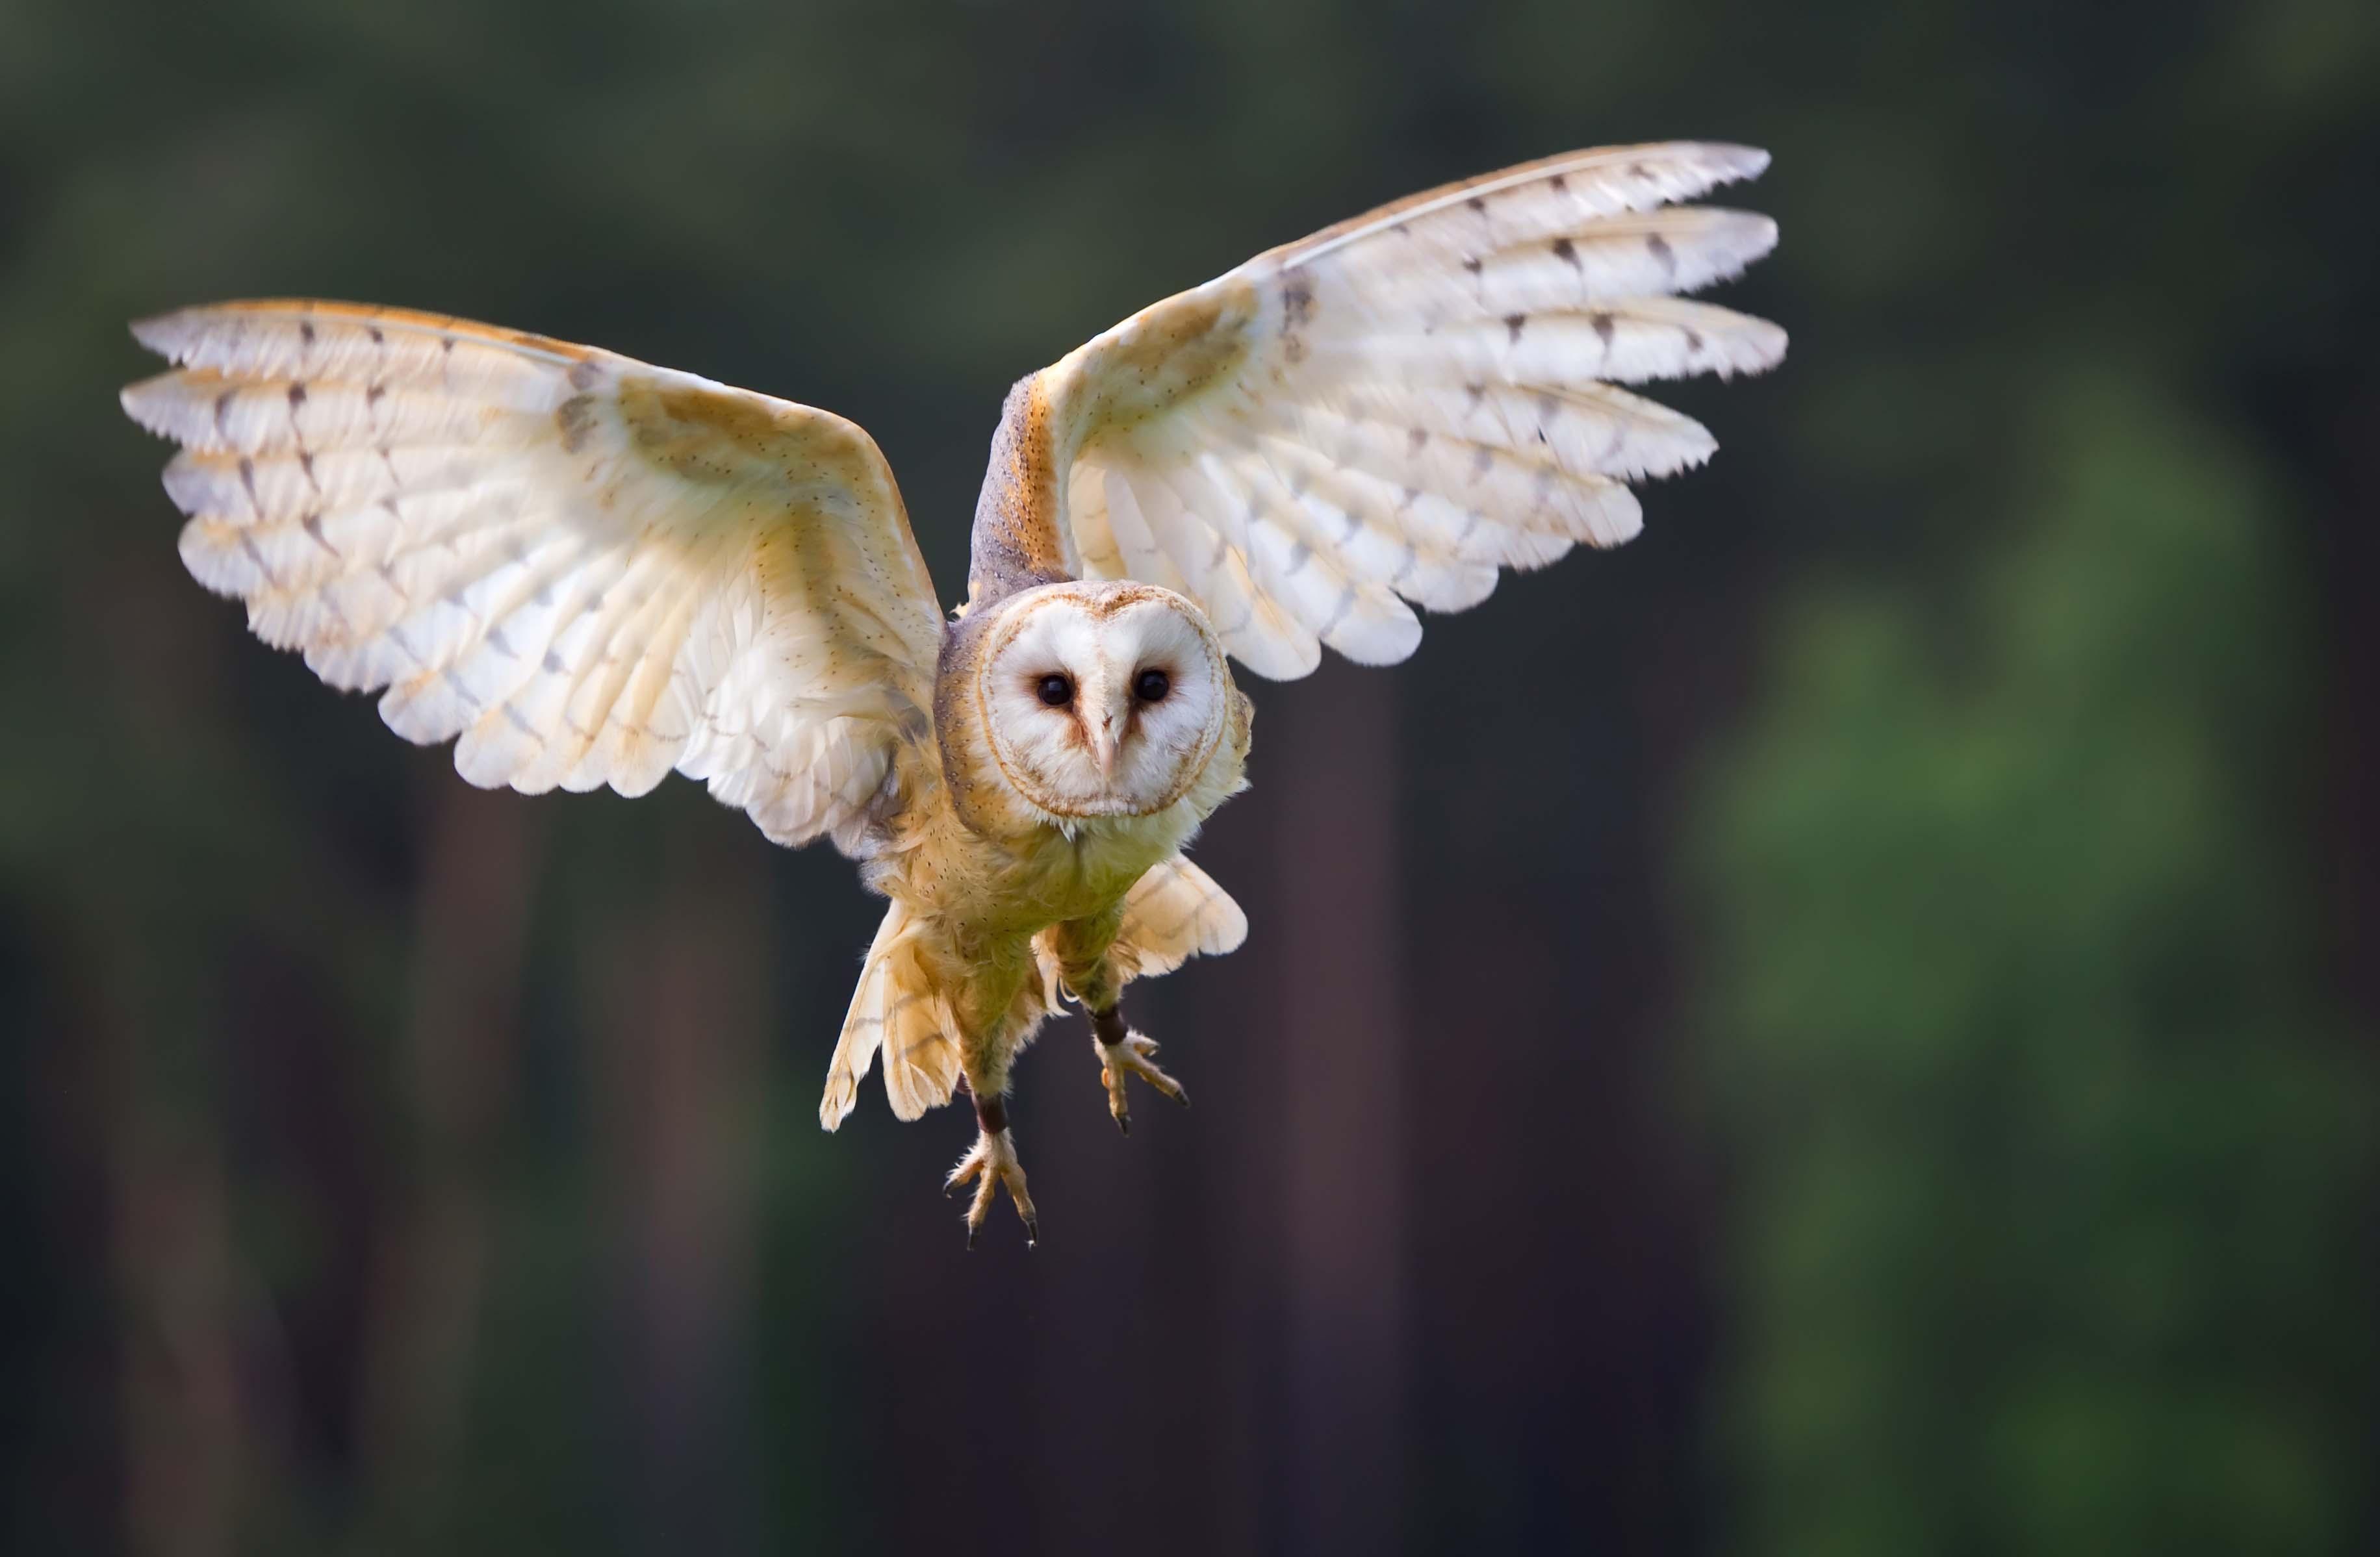 barn owl in the flight